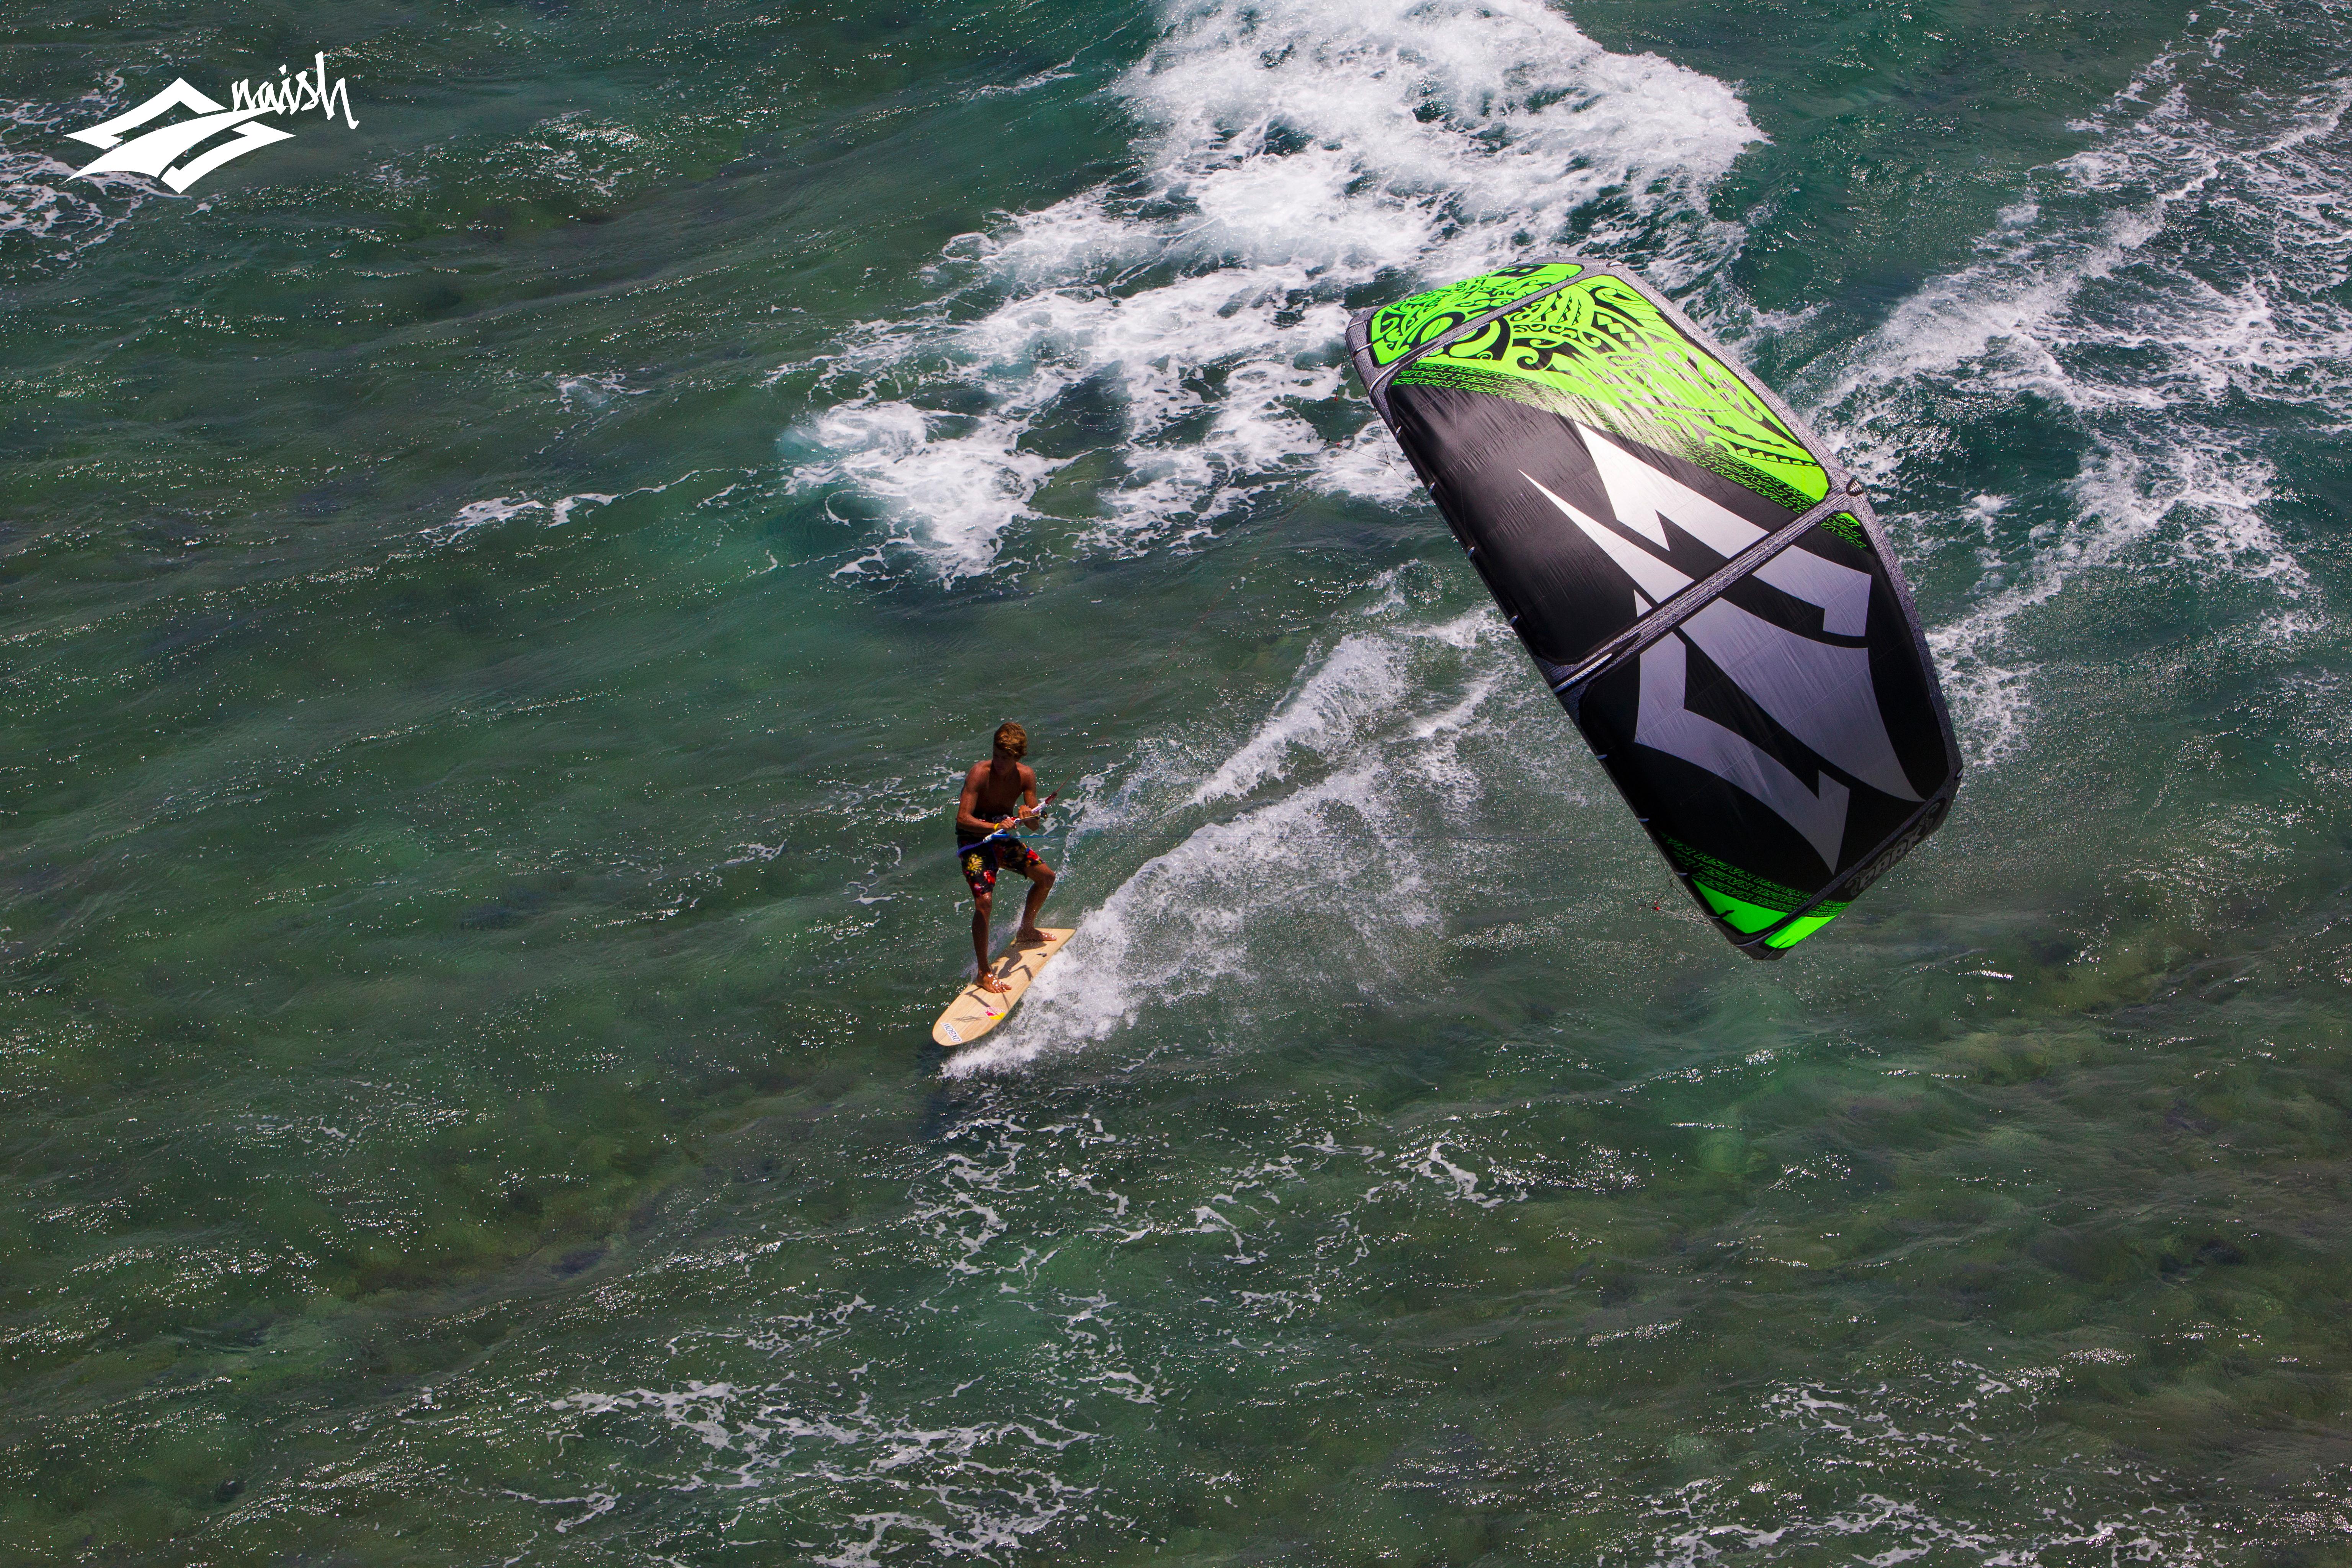 kitesurf wallpaper image - Kai Lenny cruising with the Naish Park kite and Alaia kiteboard off Hawaii - in resolution: Original 6144 X 4096